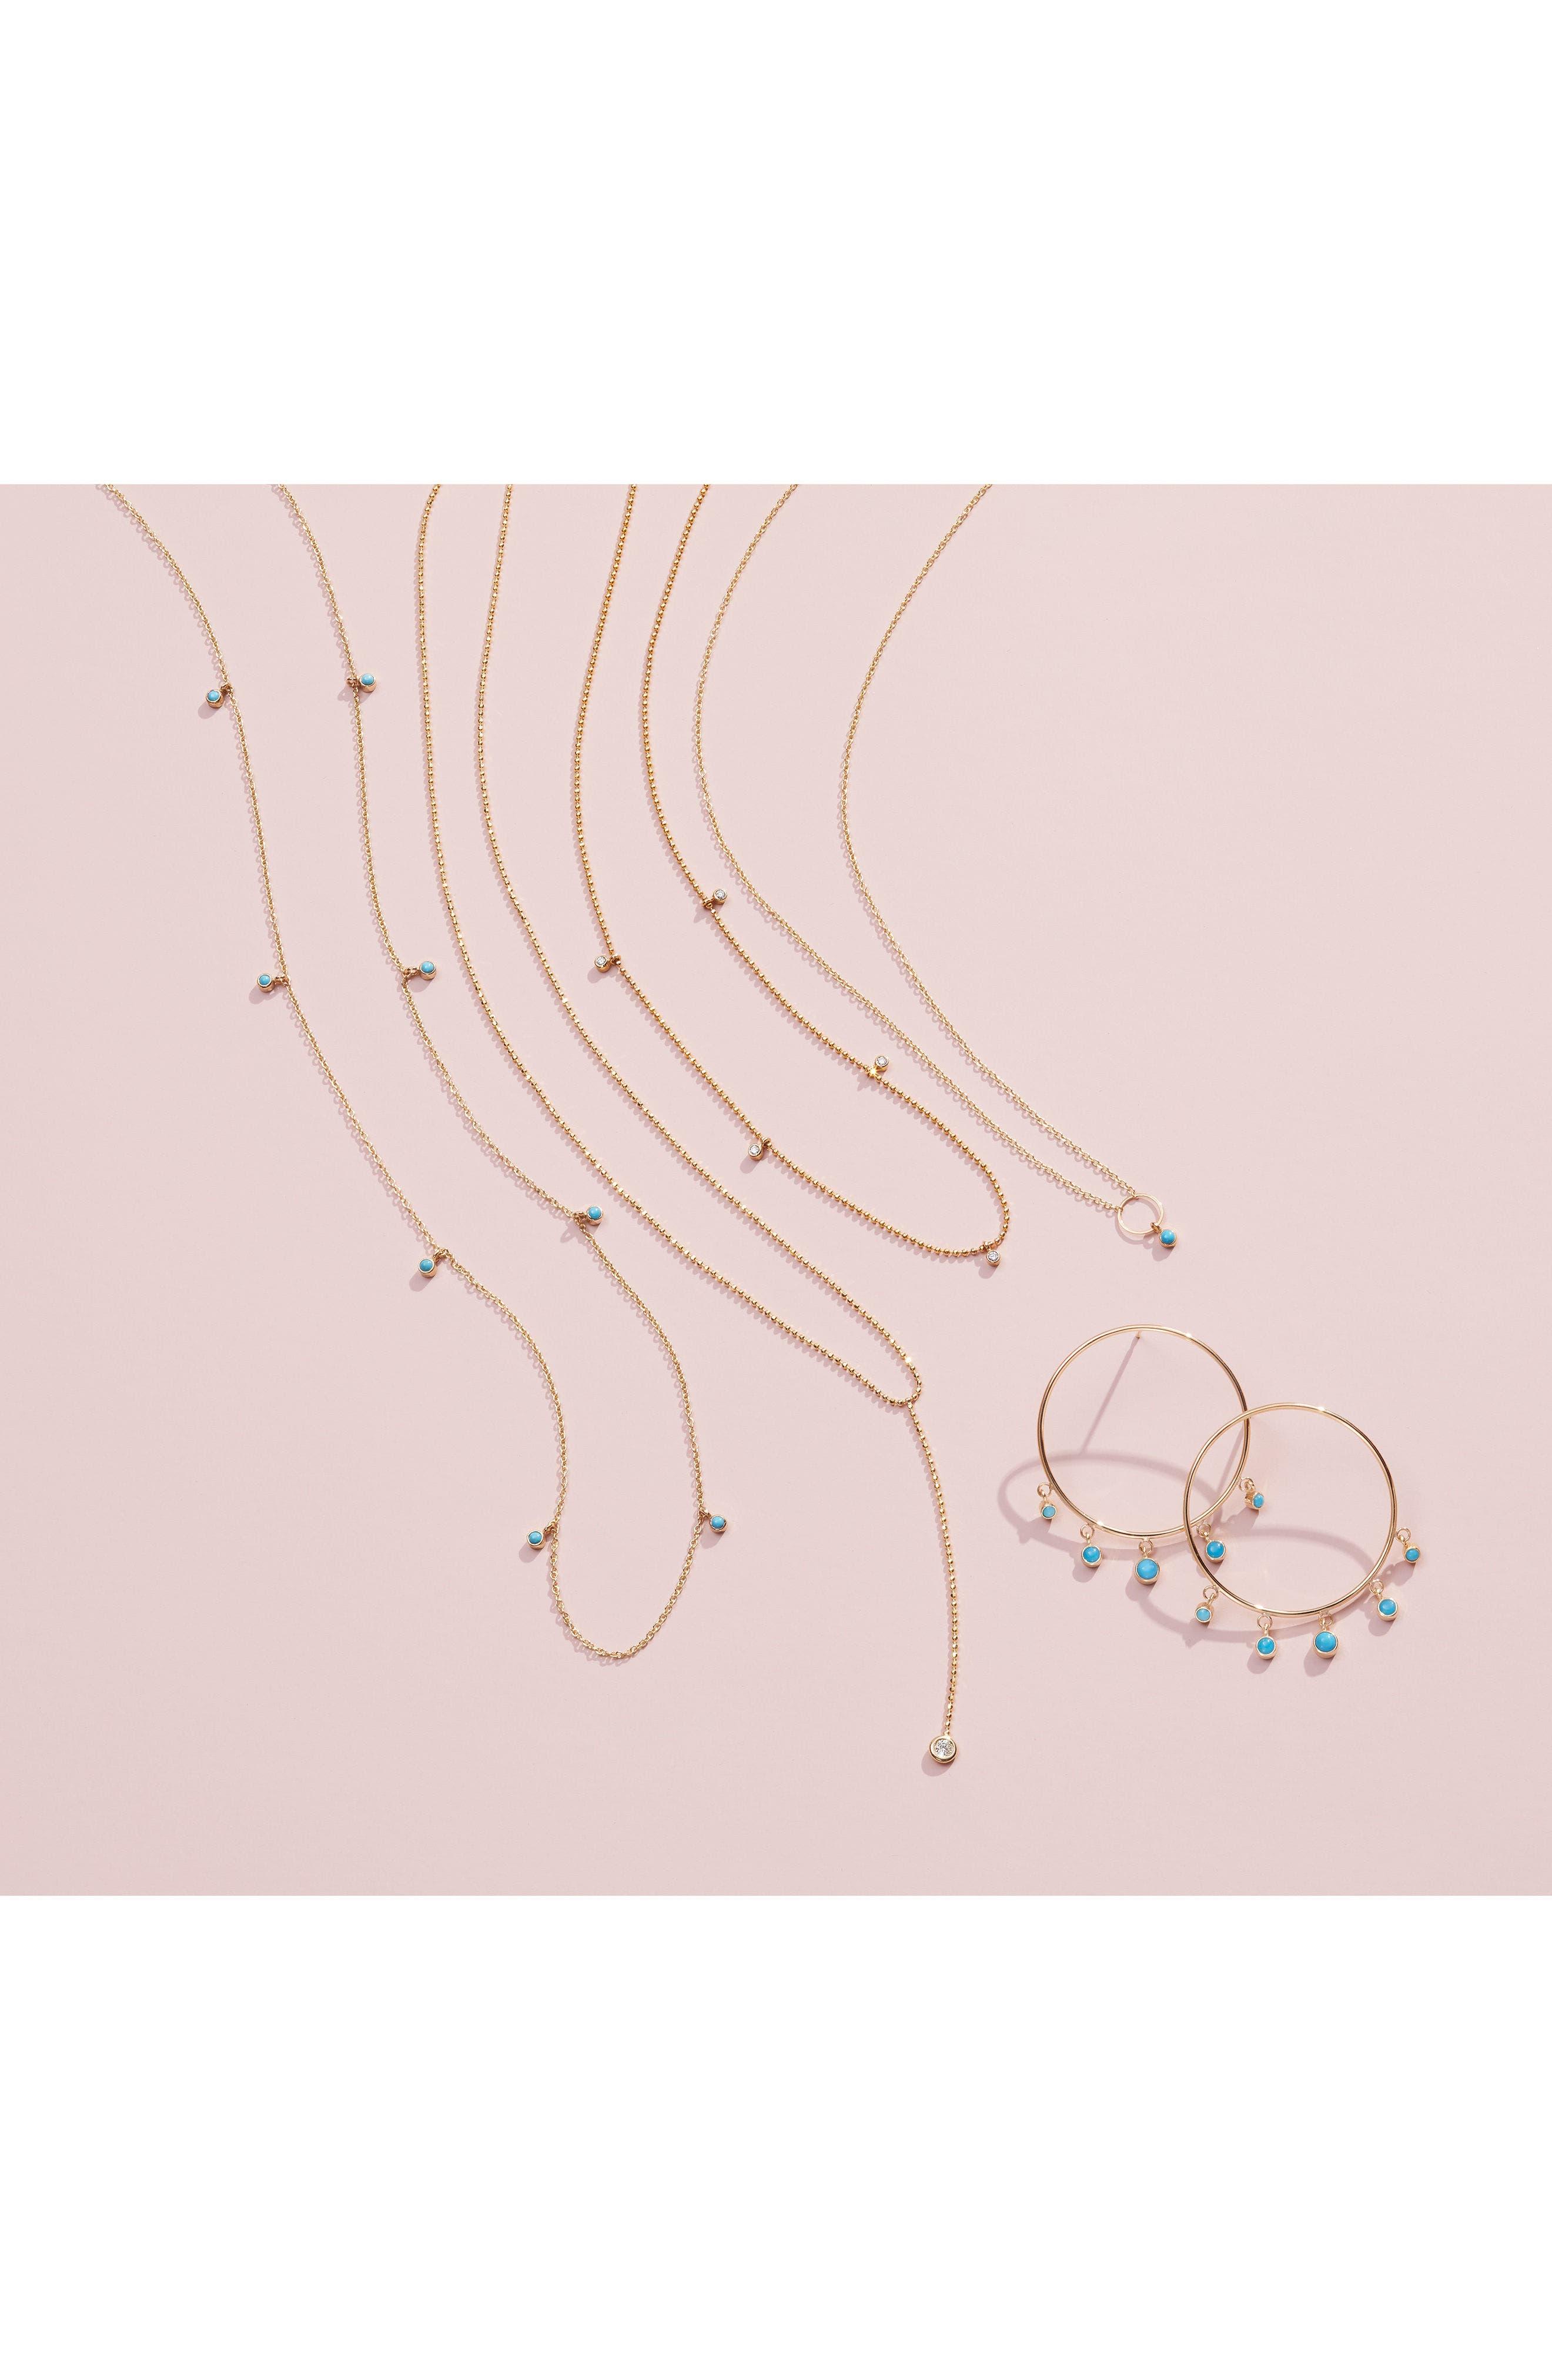 Zoe Chicco Dangling Turquoise Hoop Earrings,                             Alternate thumbnail 3, color,